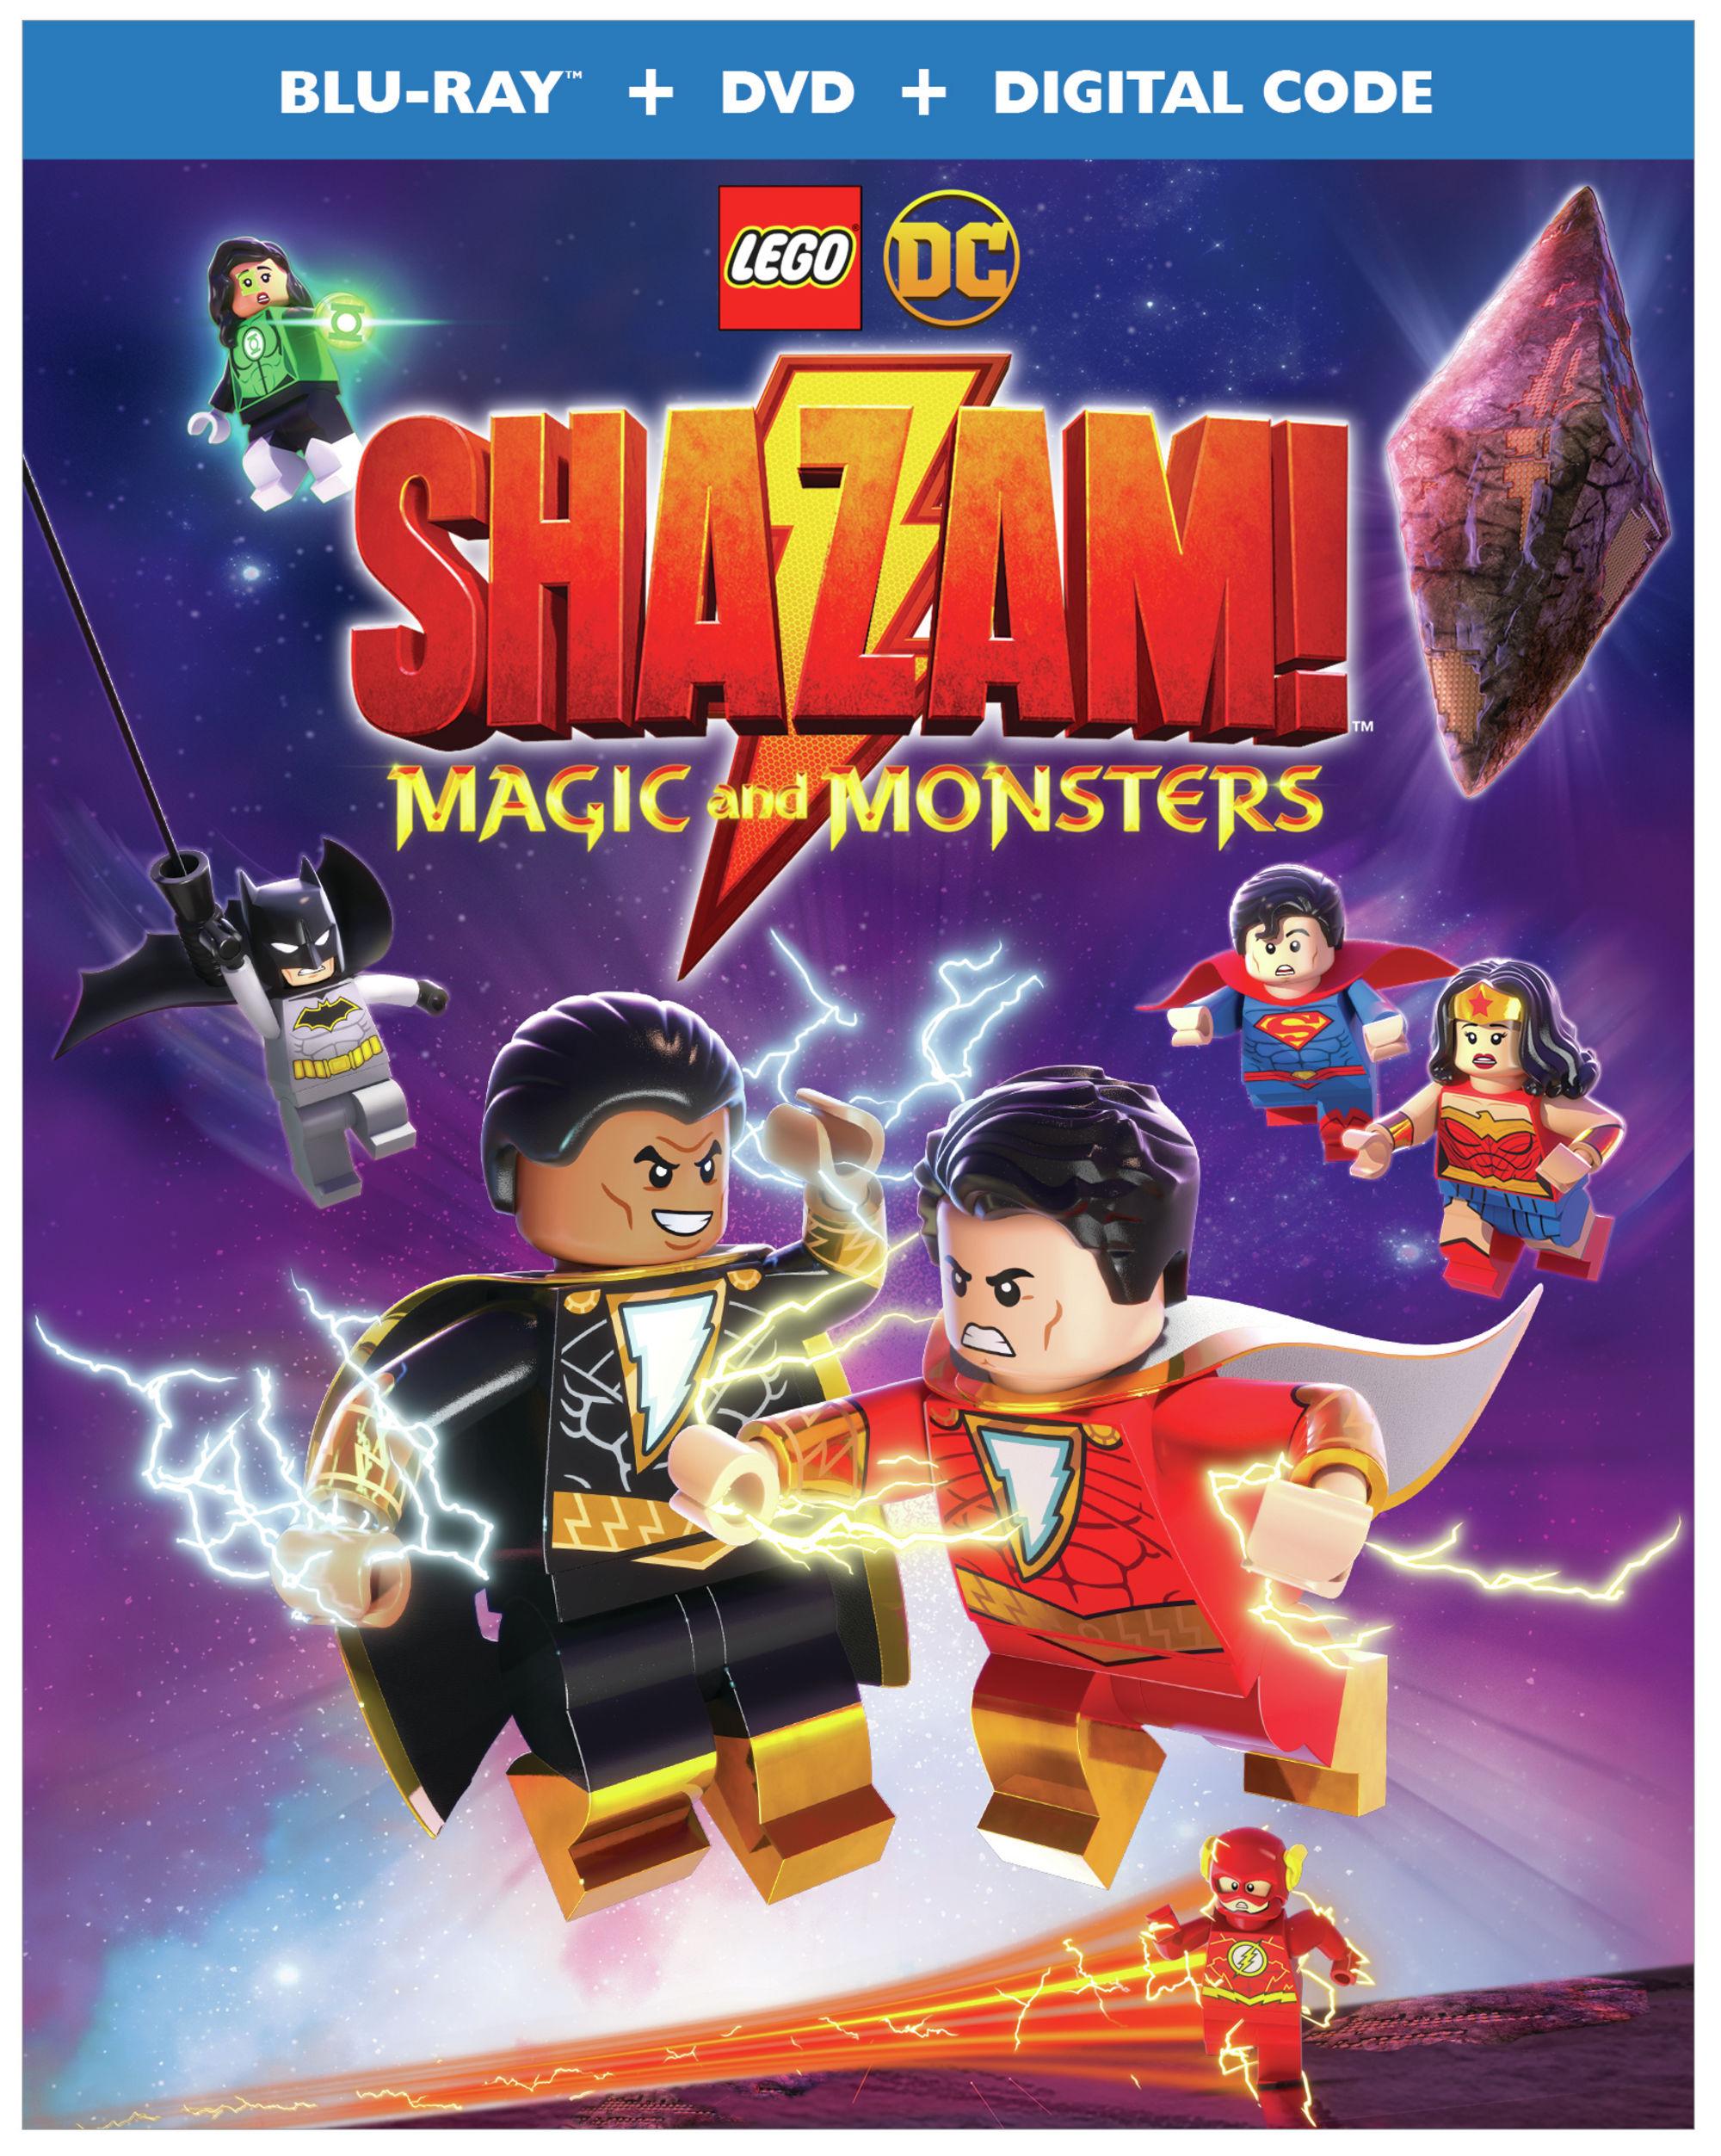 LEGO® DC: Shazam! Magic and Monsters